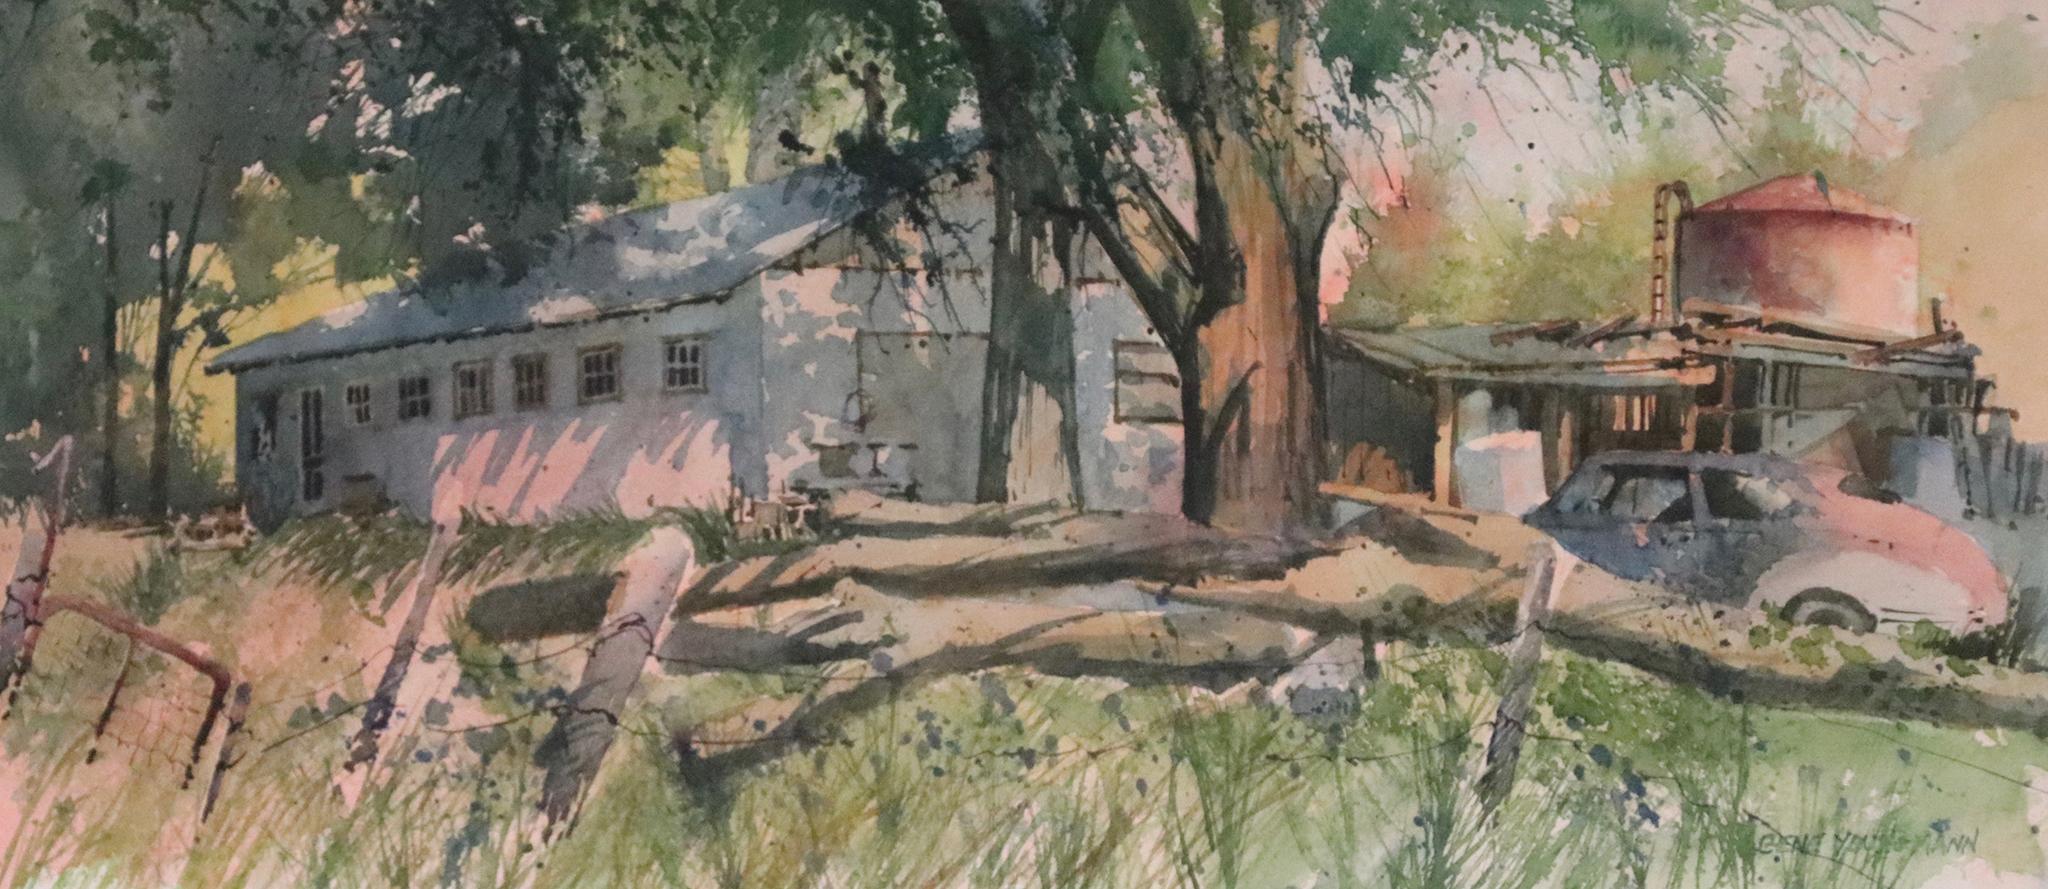 Painting #20 Junk Barn